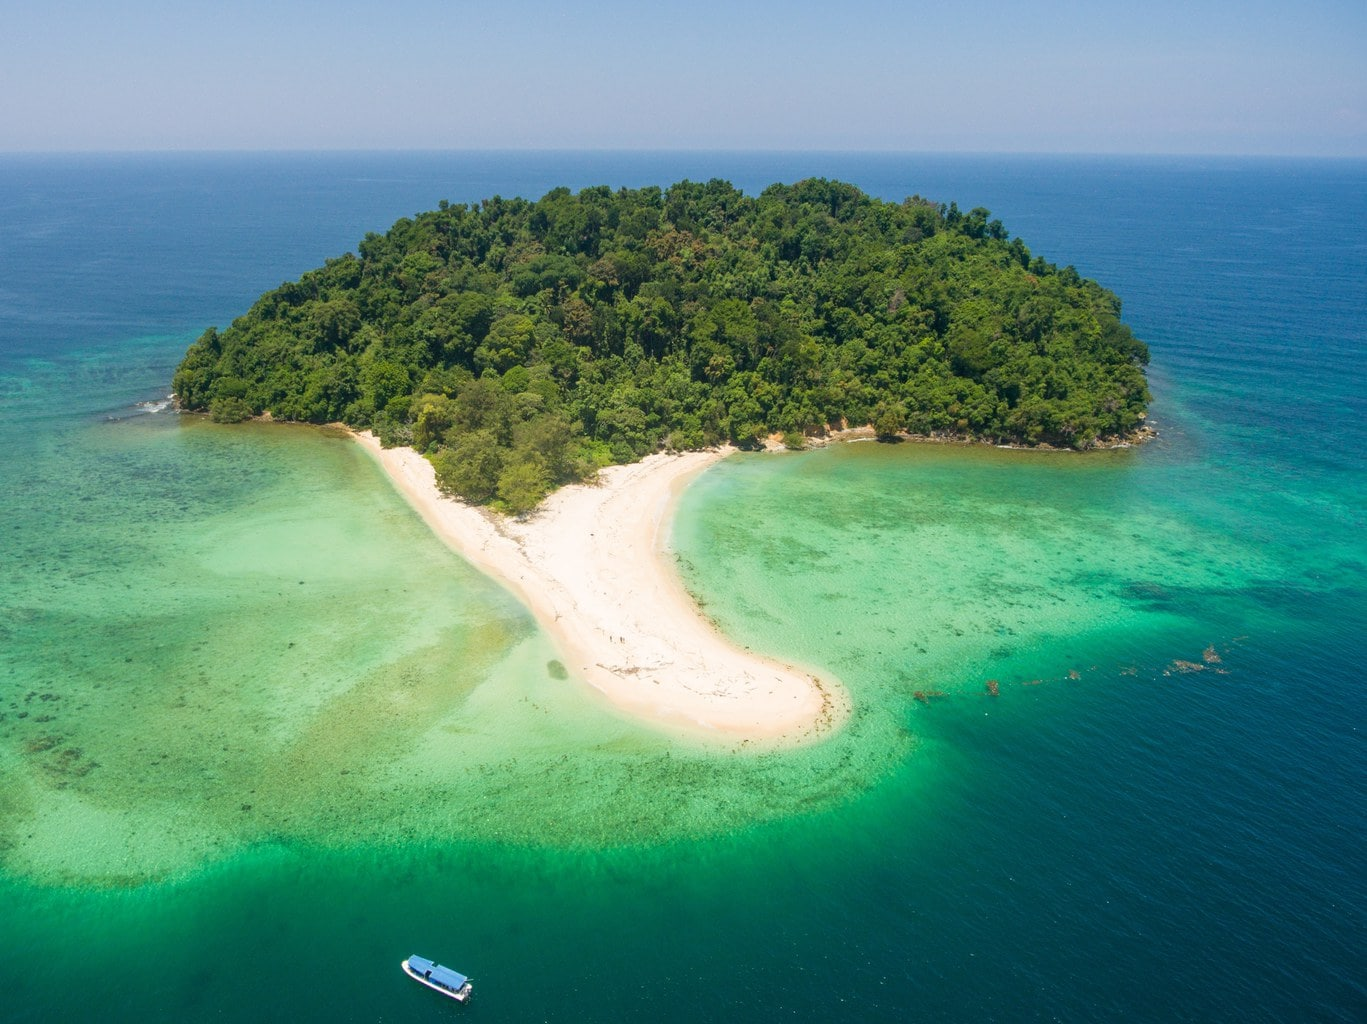 Manukan Island from the sky